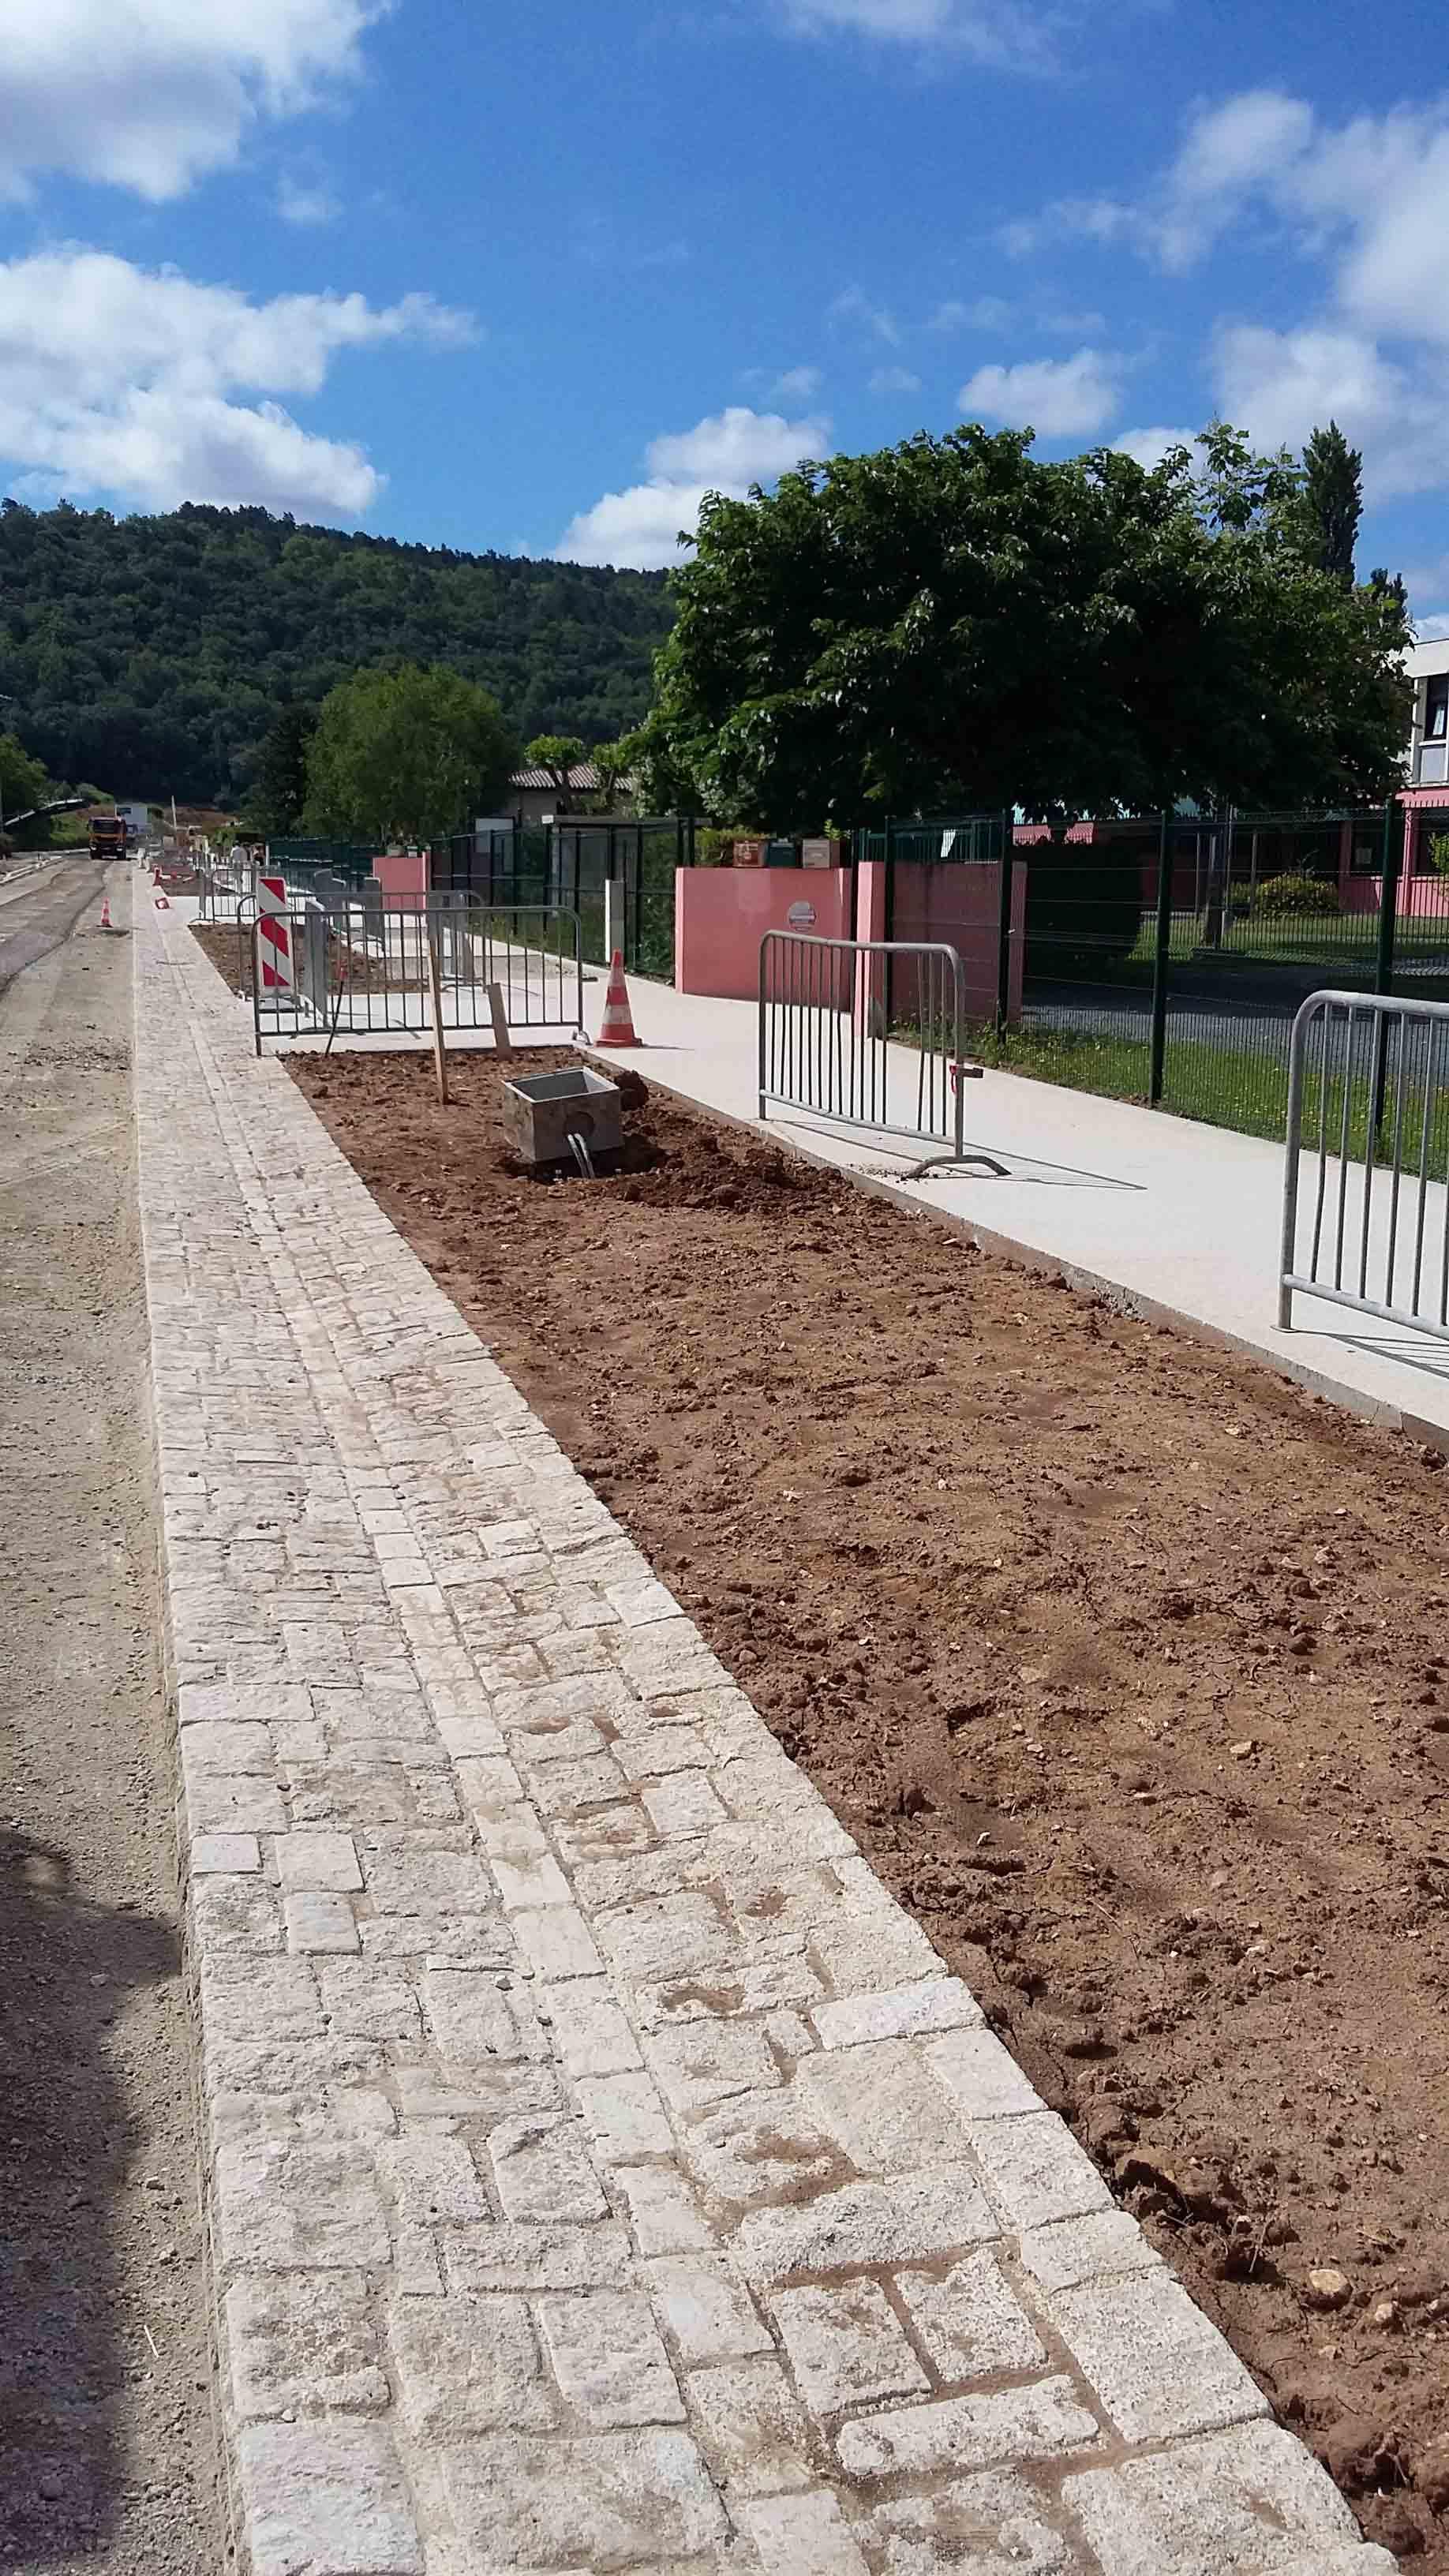 Aménagement urbain voiries Montignac 2